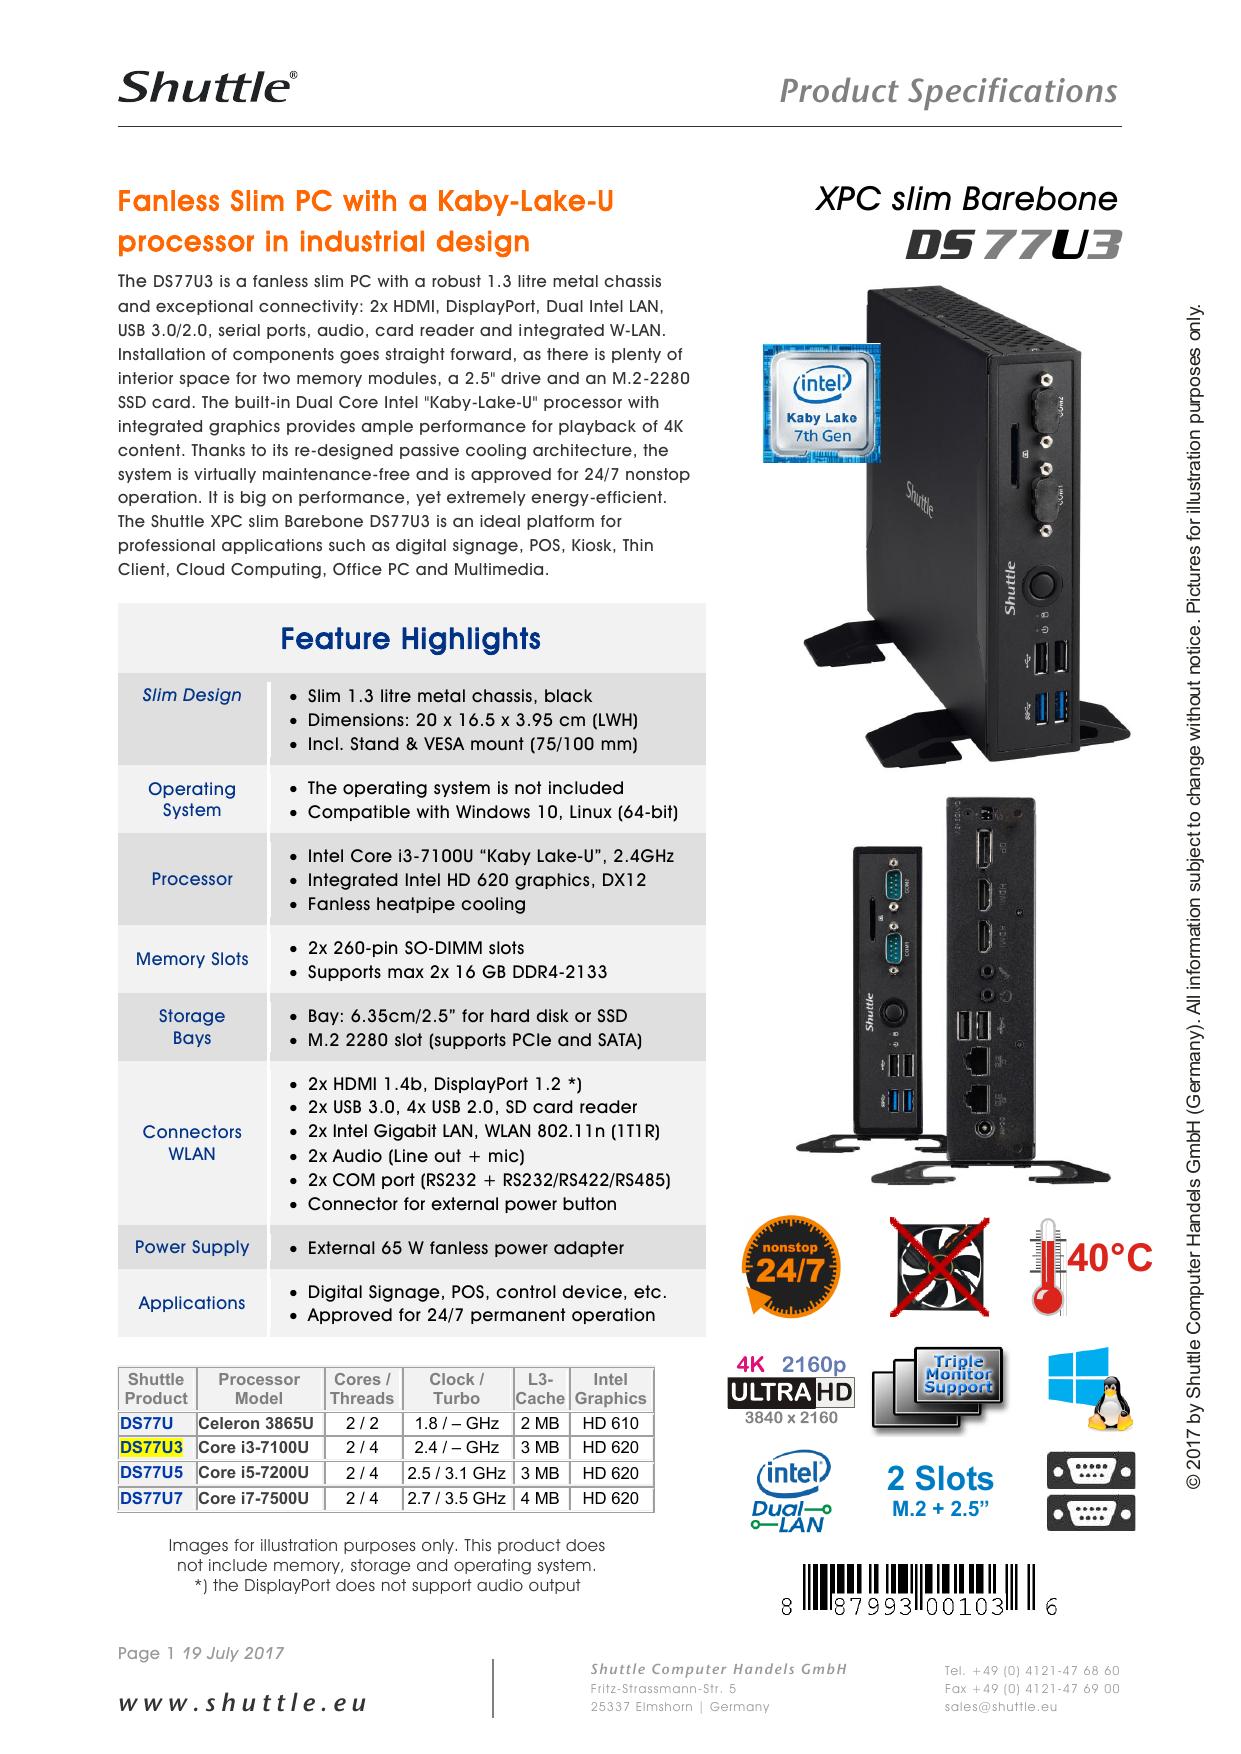 Specifications DS77U3 | manualzz com